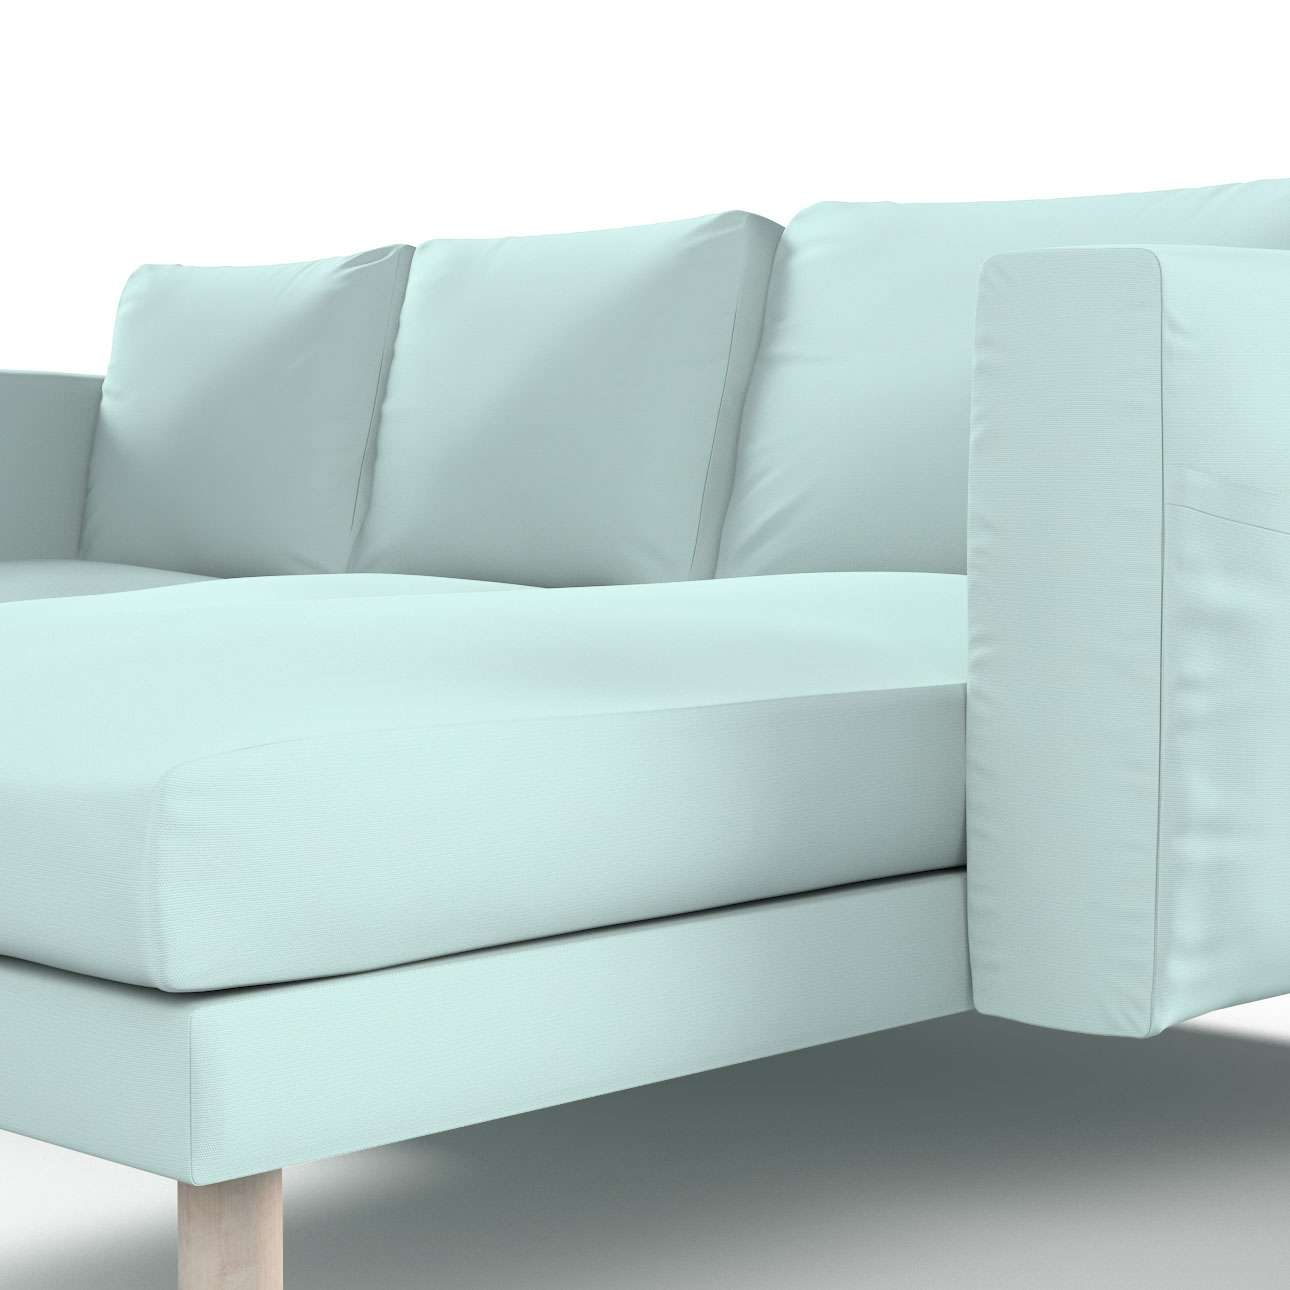 norsborg bezug f r 3 sitzer sofa mit recamiere hellblau dekoria. Black Bedroom Furniture Sets. Home Design Ideas